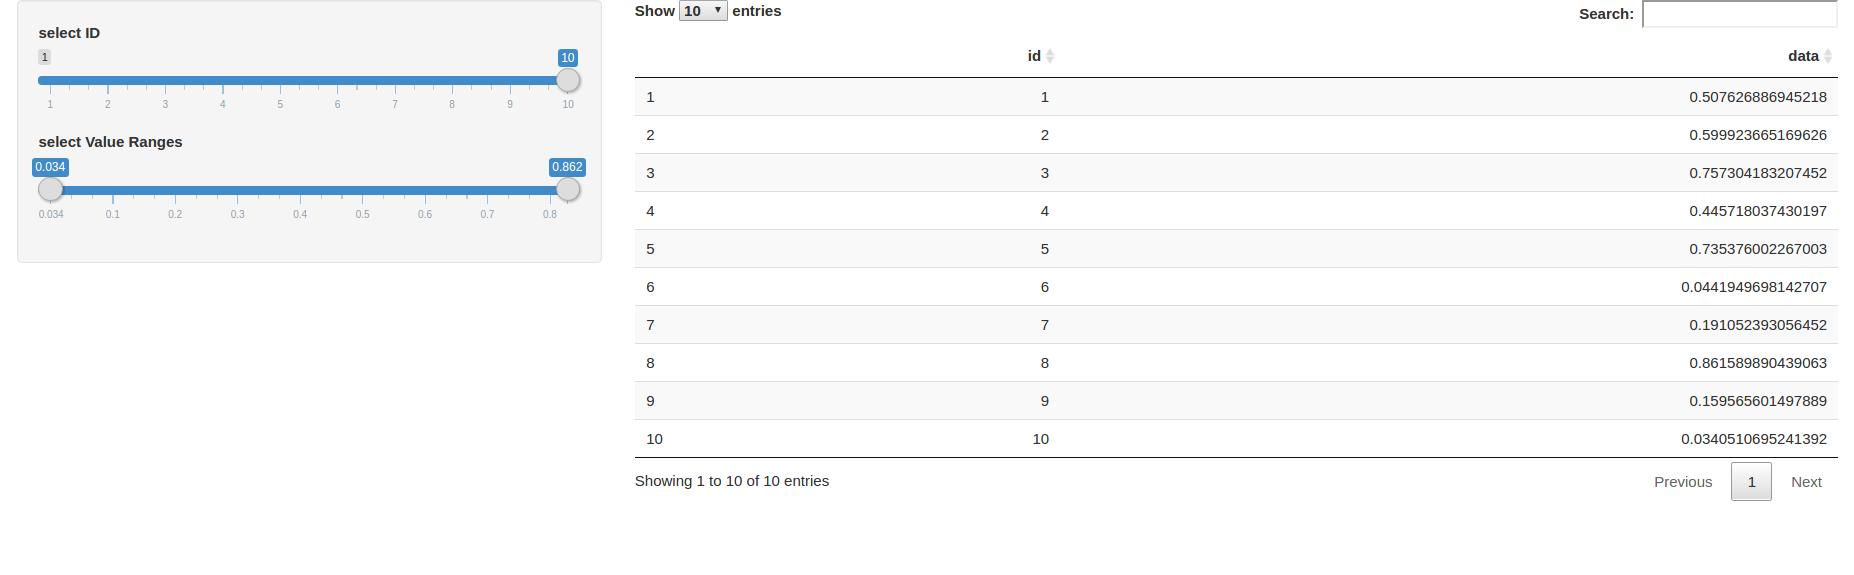 Visualizing data in PostgreSQL with R Shiny